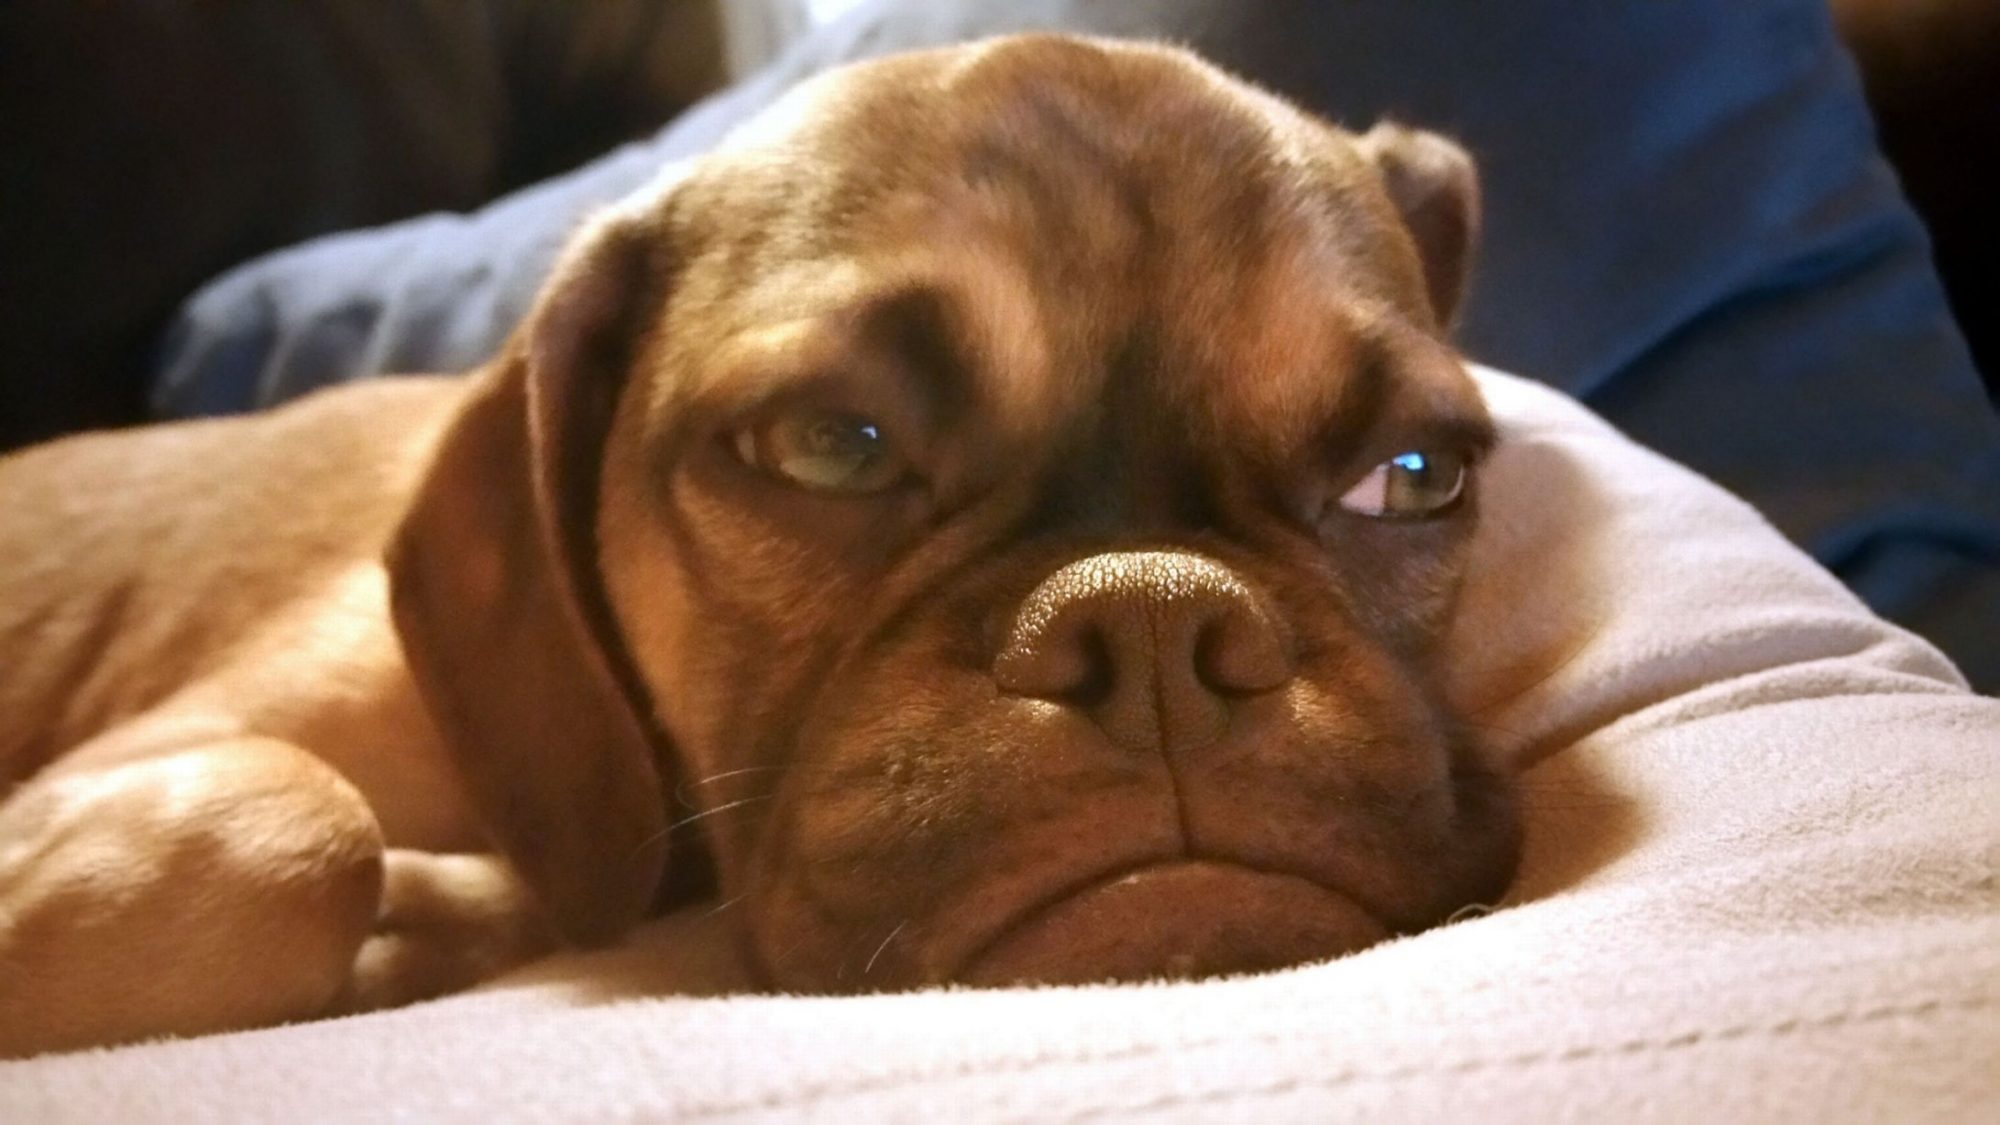 PAY-Grumpy-Earl-the-dog